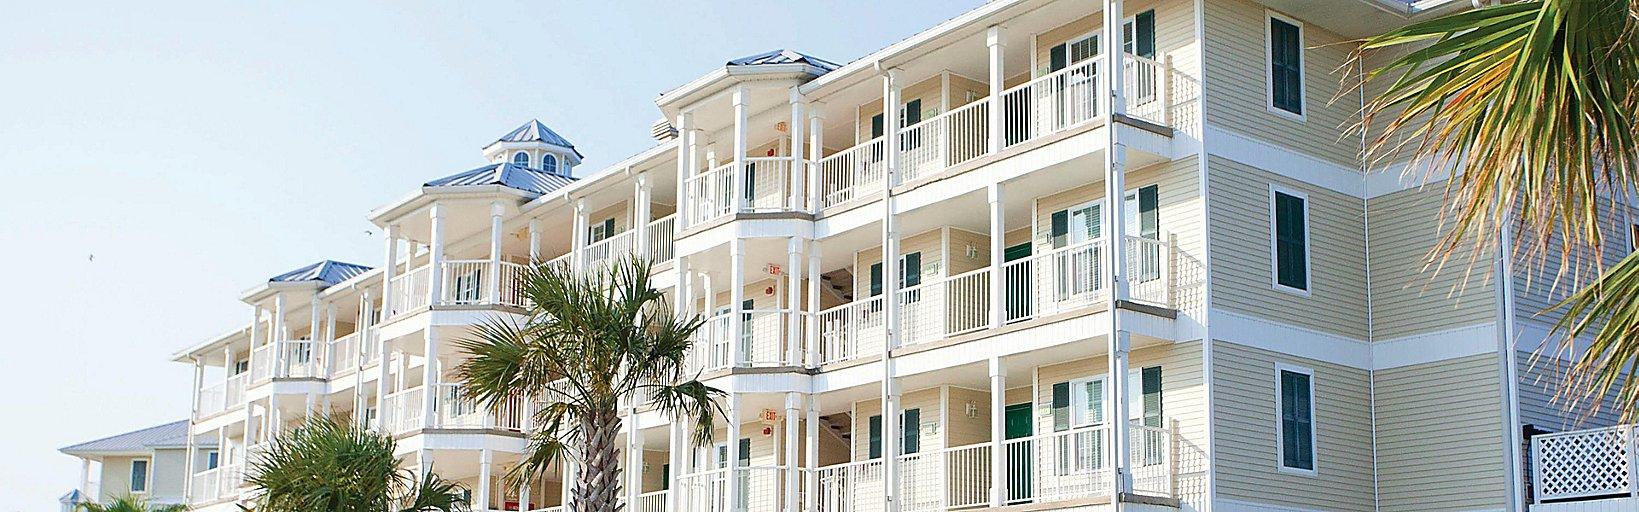 Hotels In Galveston, TX | Holiday Inn Club Vacations